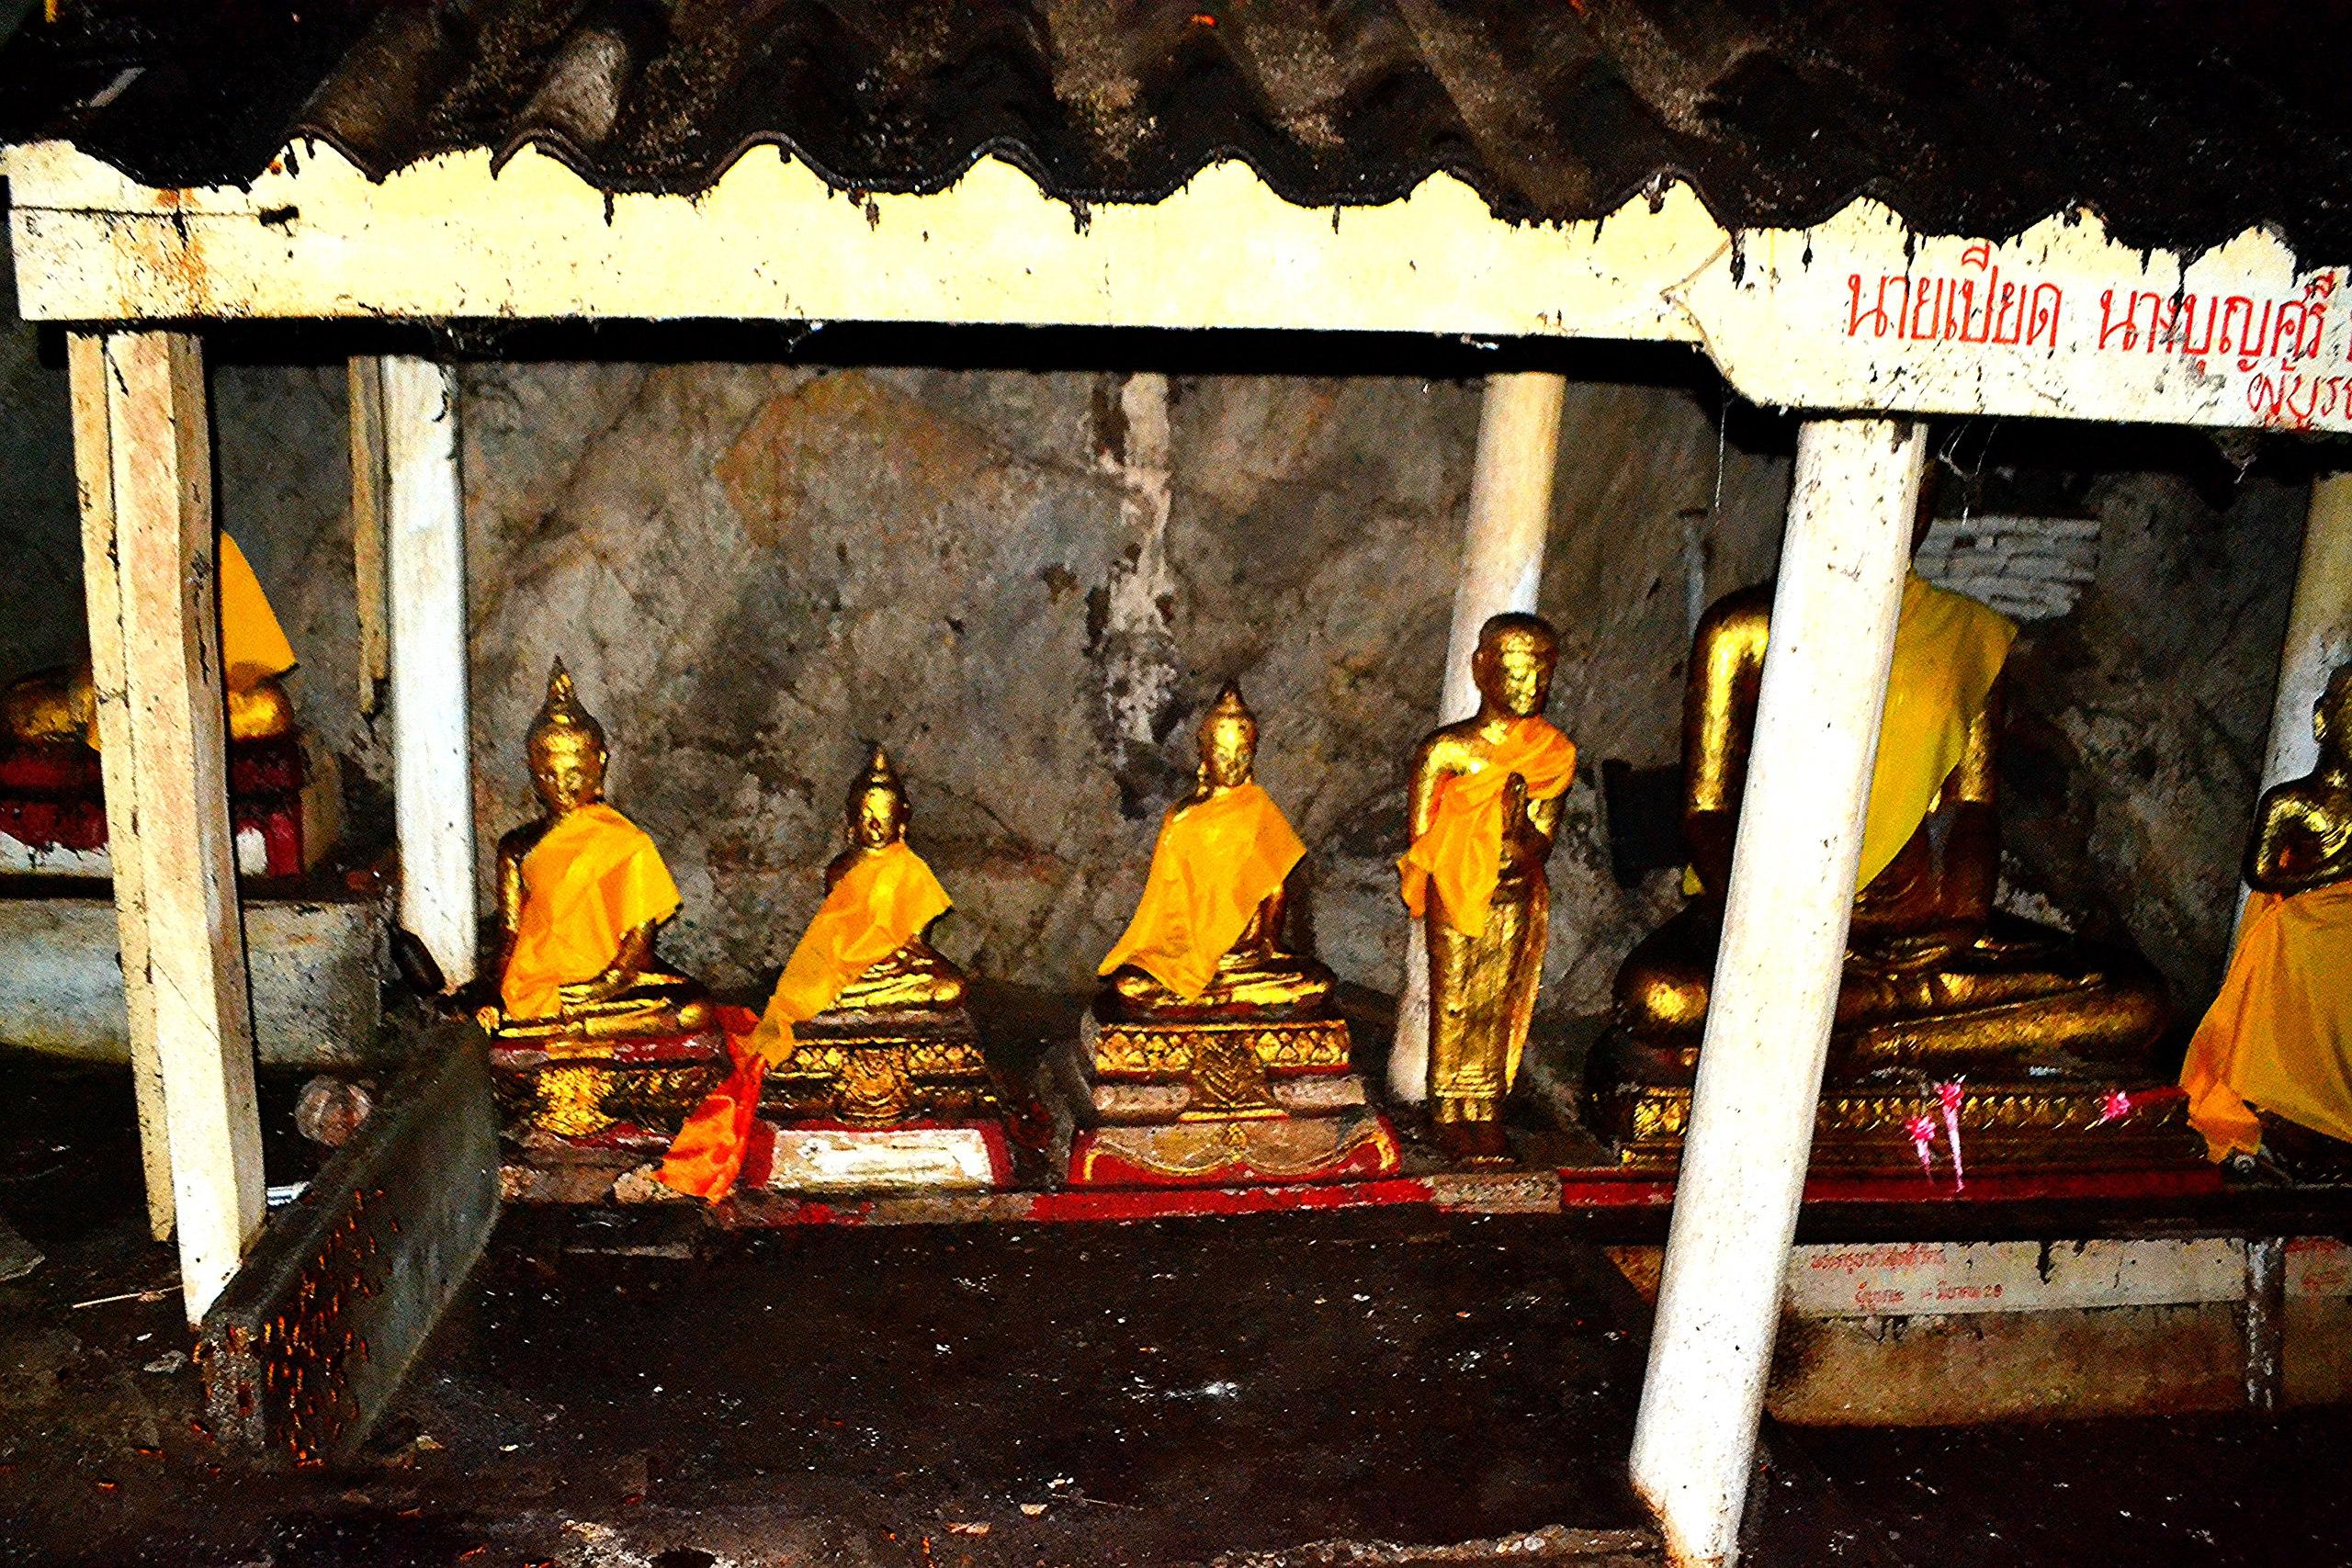 Елена Руденко (Валтея). Таиланд. Таиланд. Paтчaбуpи: Пещера страха, Пещера мышей, Буддийский храм Me1XsB2TLxE